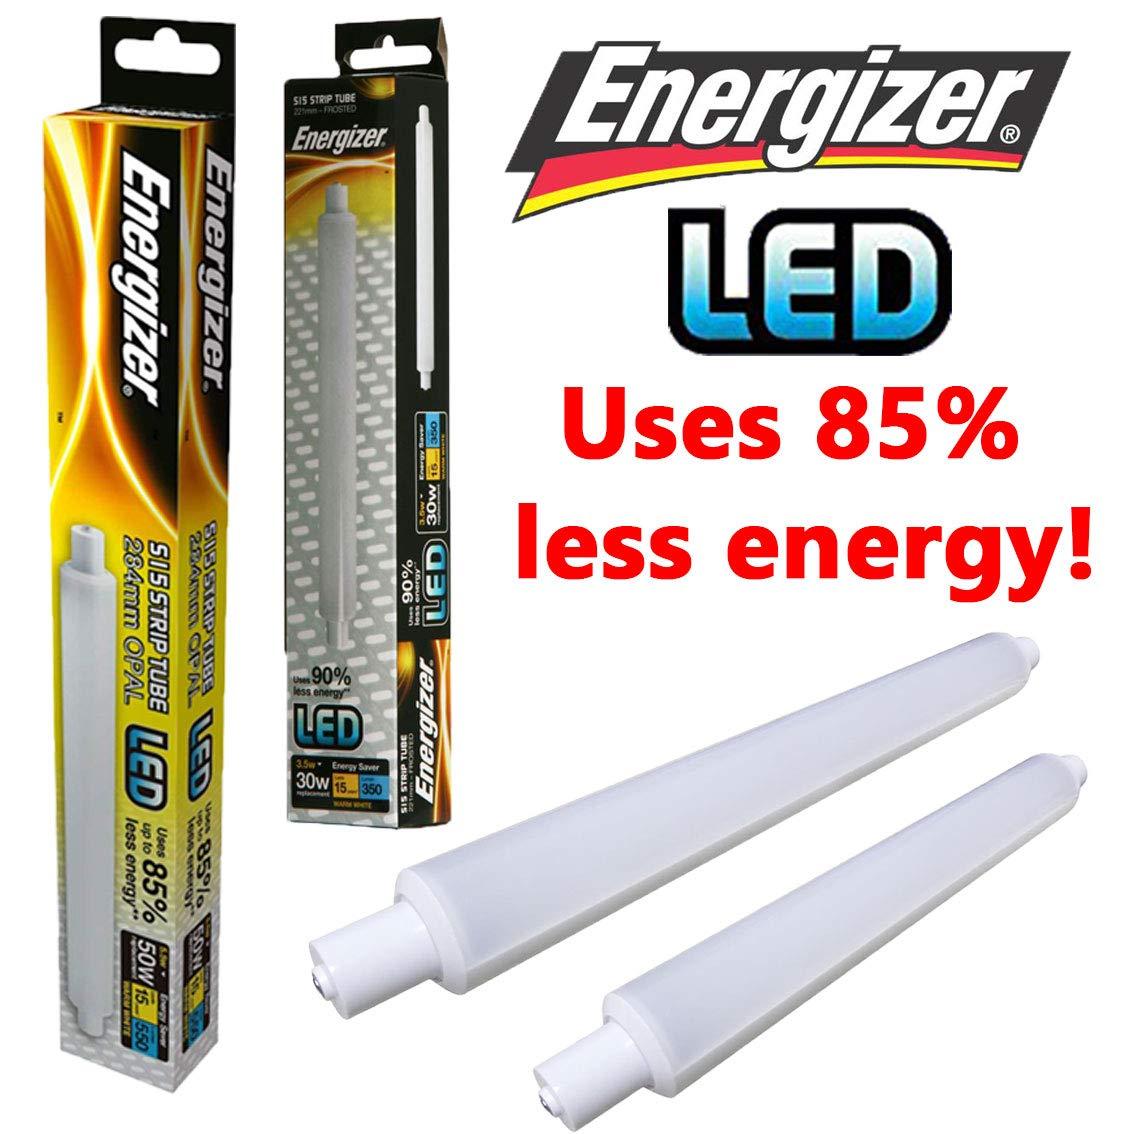 Energizer LED Strip Energy Saving Lightbulb, S15s, 5.5 W, Warm White S9218